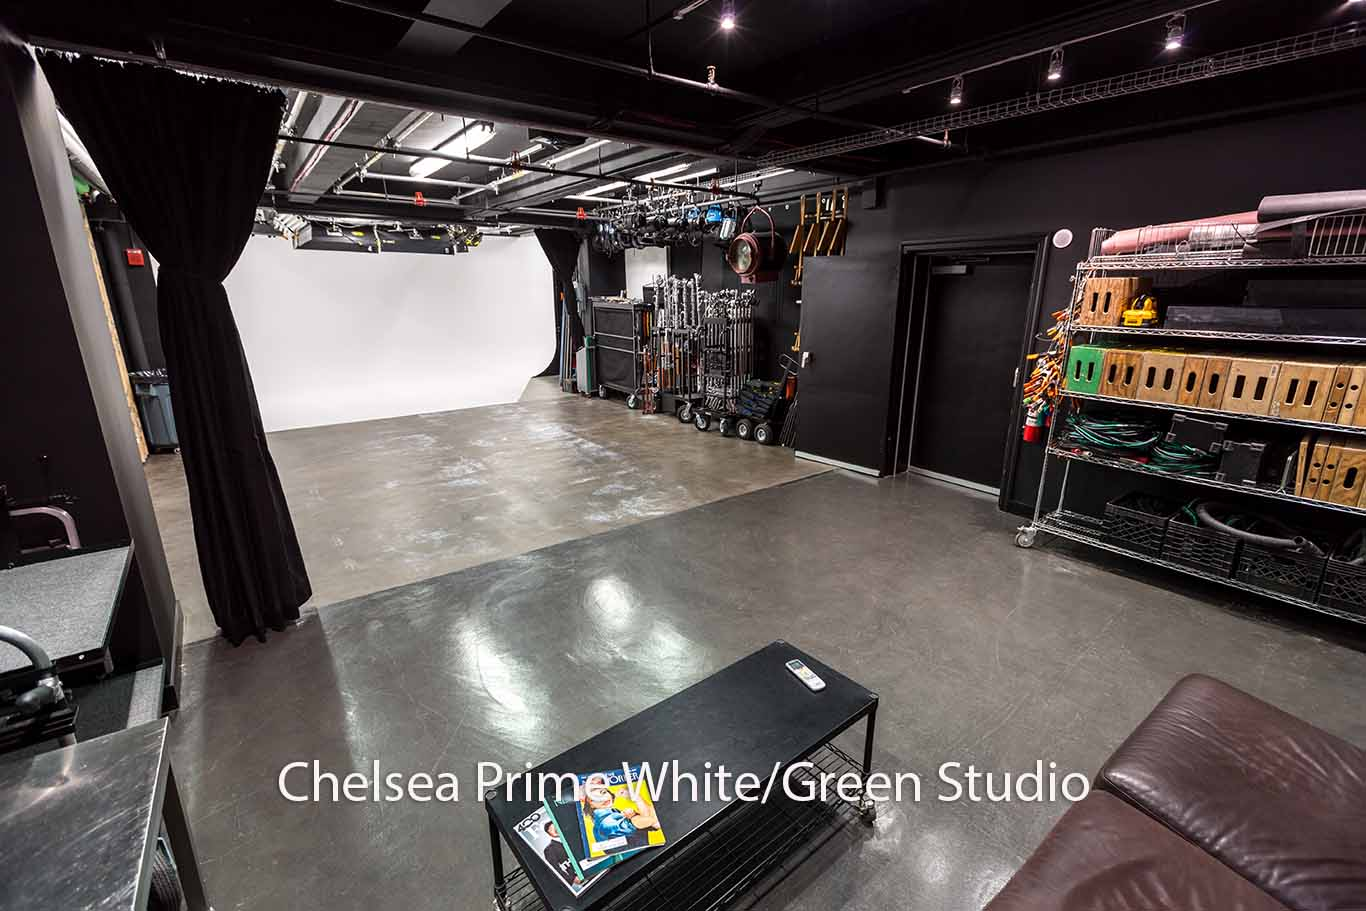 Chelsea Prime White/Green Studio